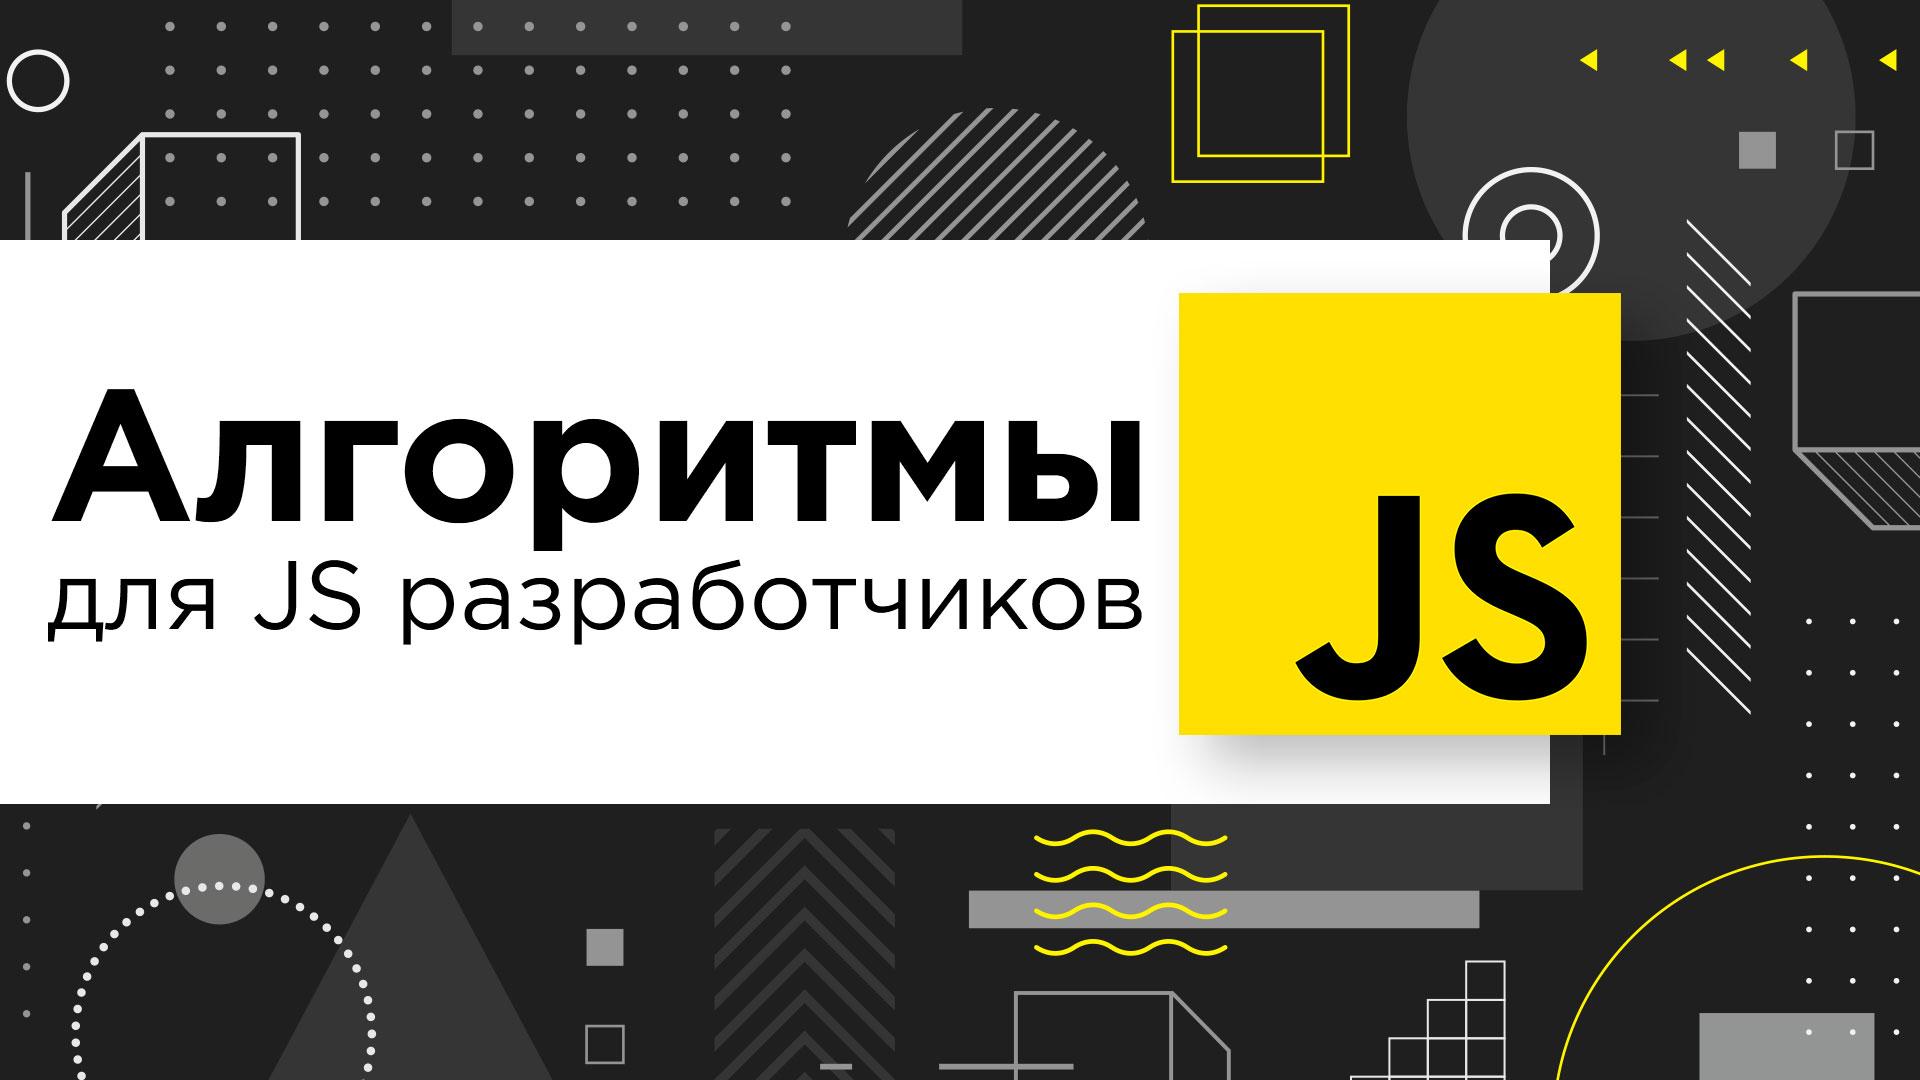 5 must have алгоритмов для JavaScript разработчиков